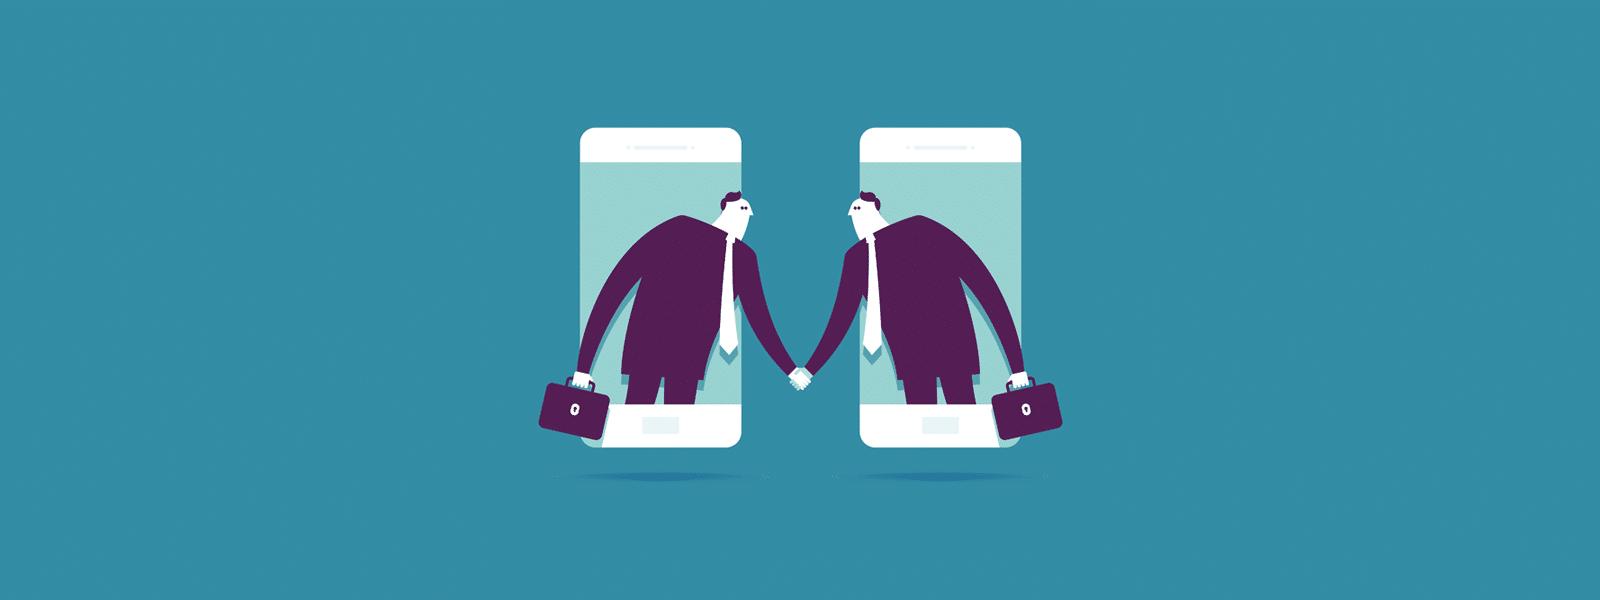 Own the customer relationship through incredibly accurate predictive algorithms